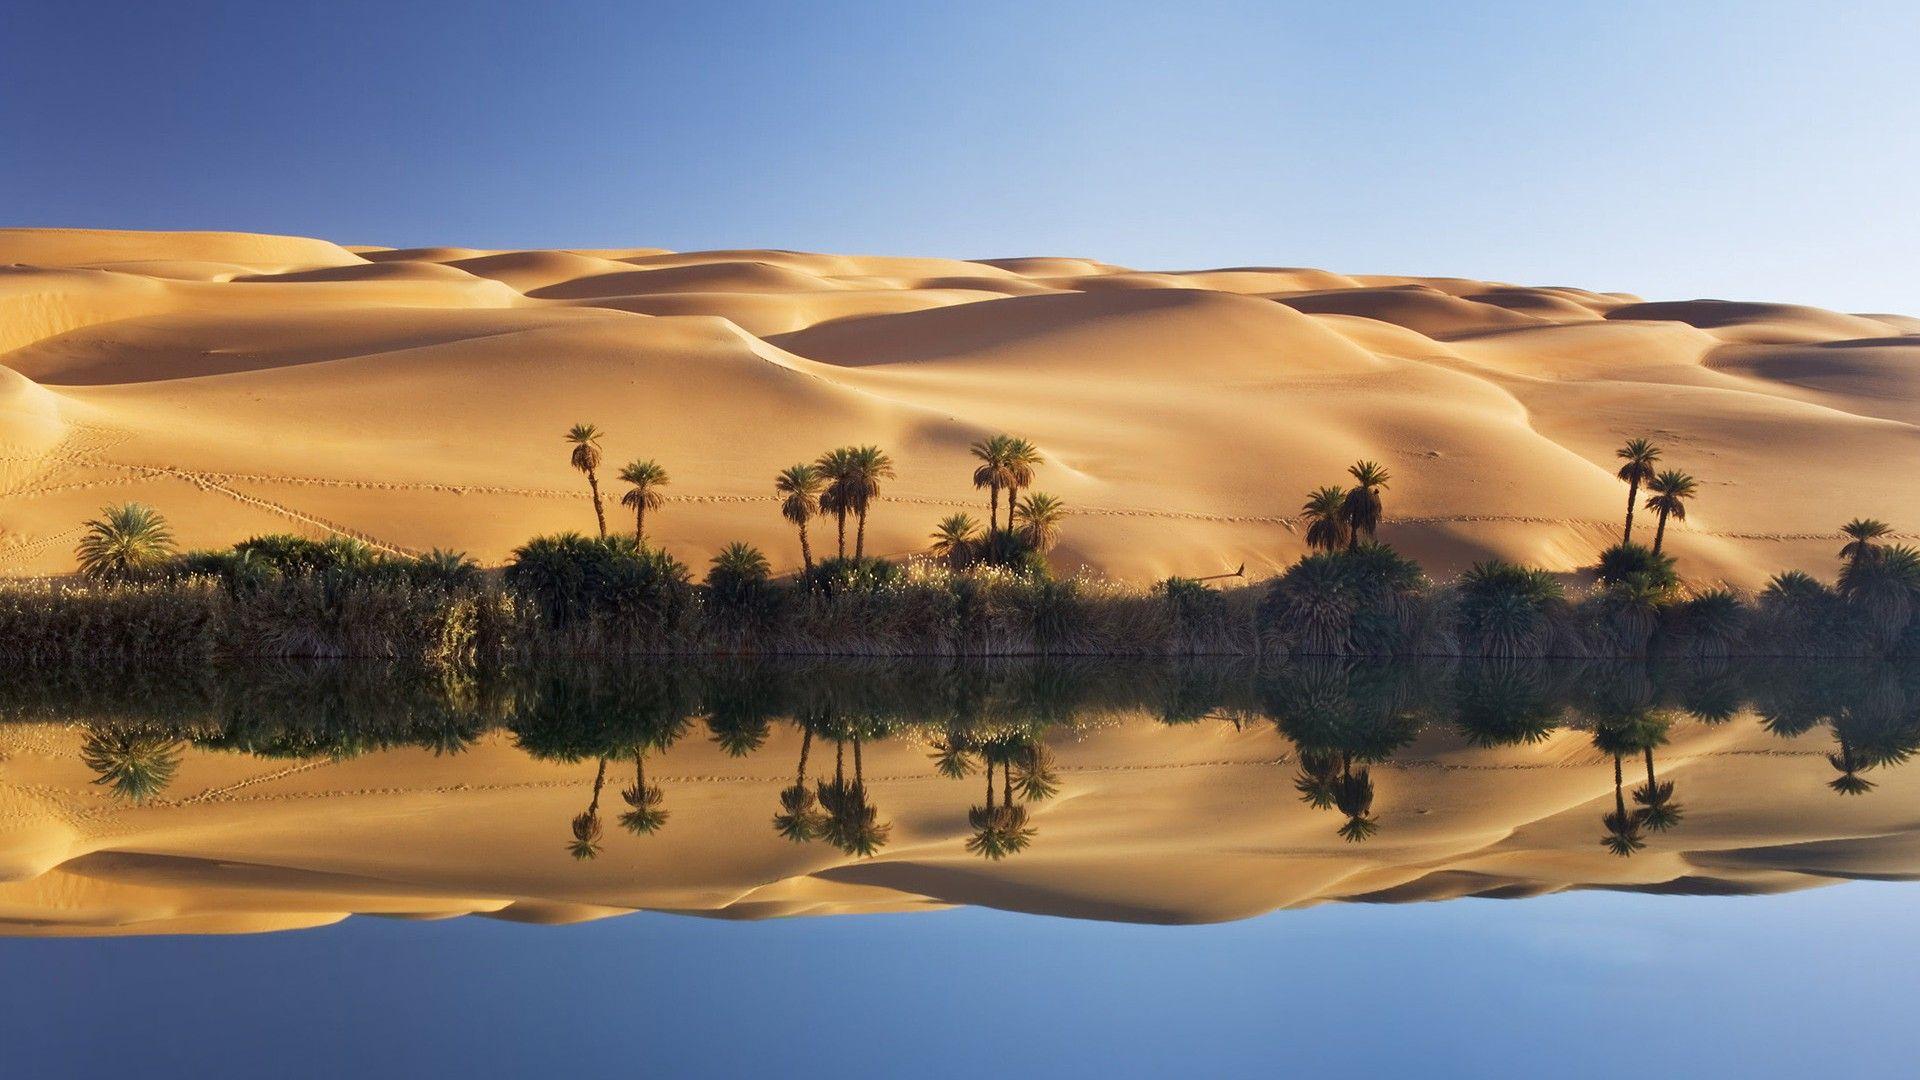 Oasis desktop image